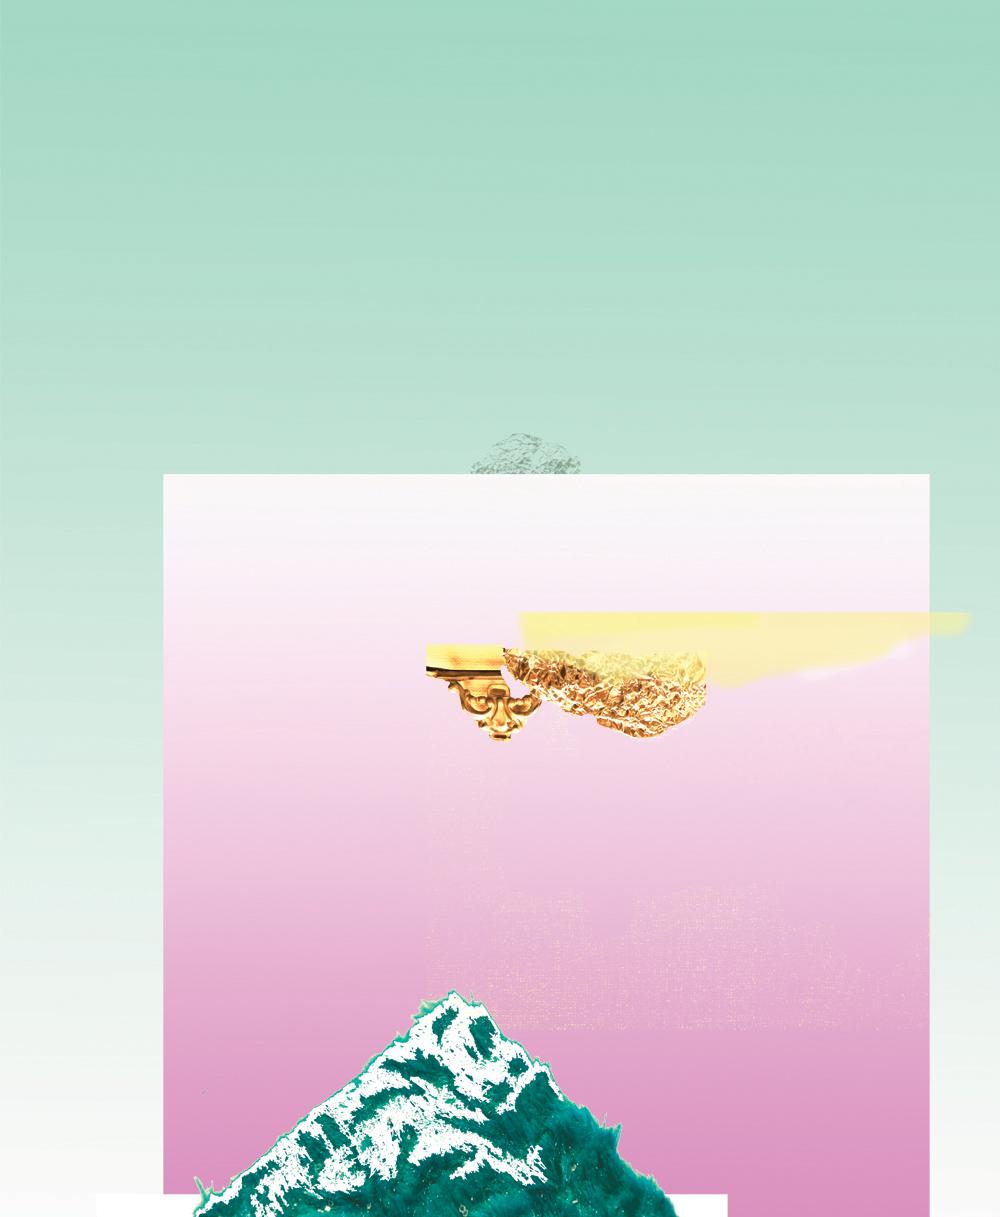 veronika-draotova-Hyper- Flow